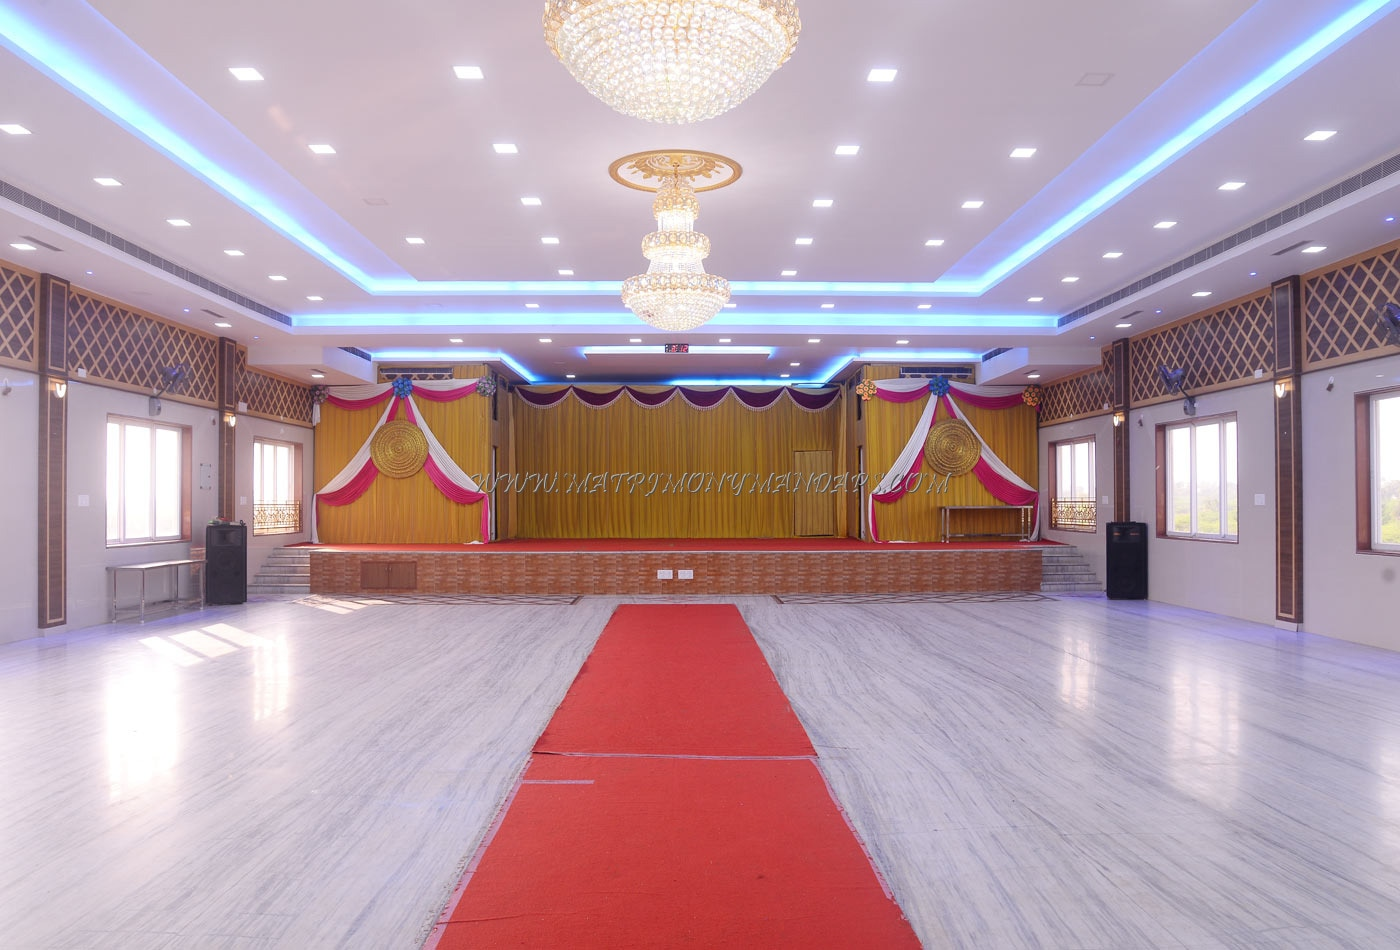 Sri Devi Vinayaga Thirumana Mahal - Hall